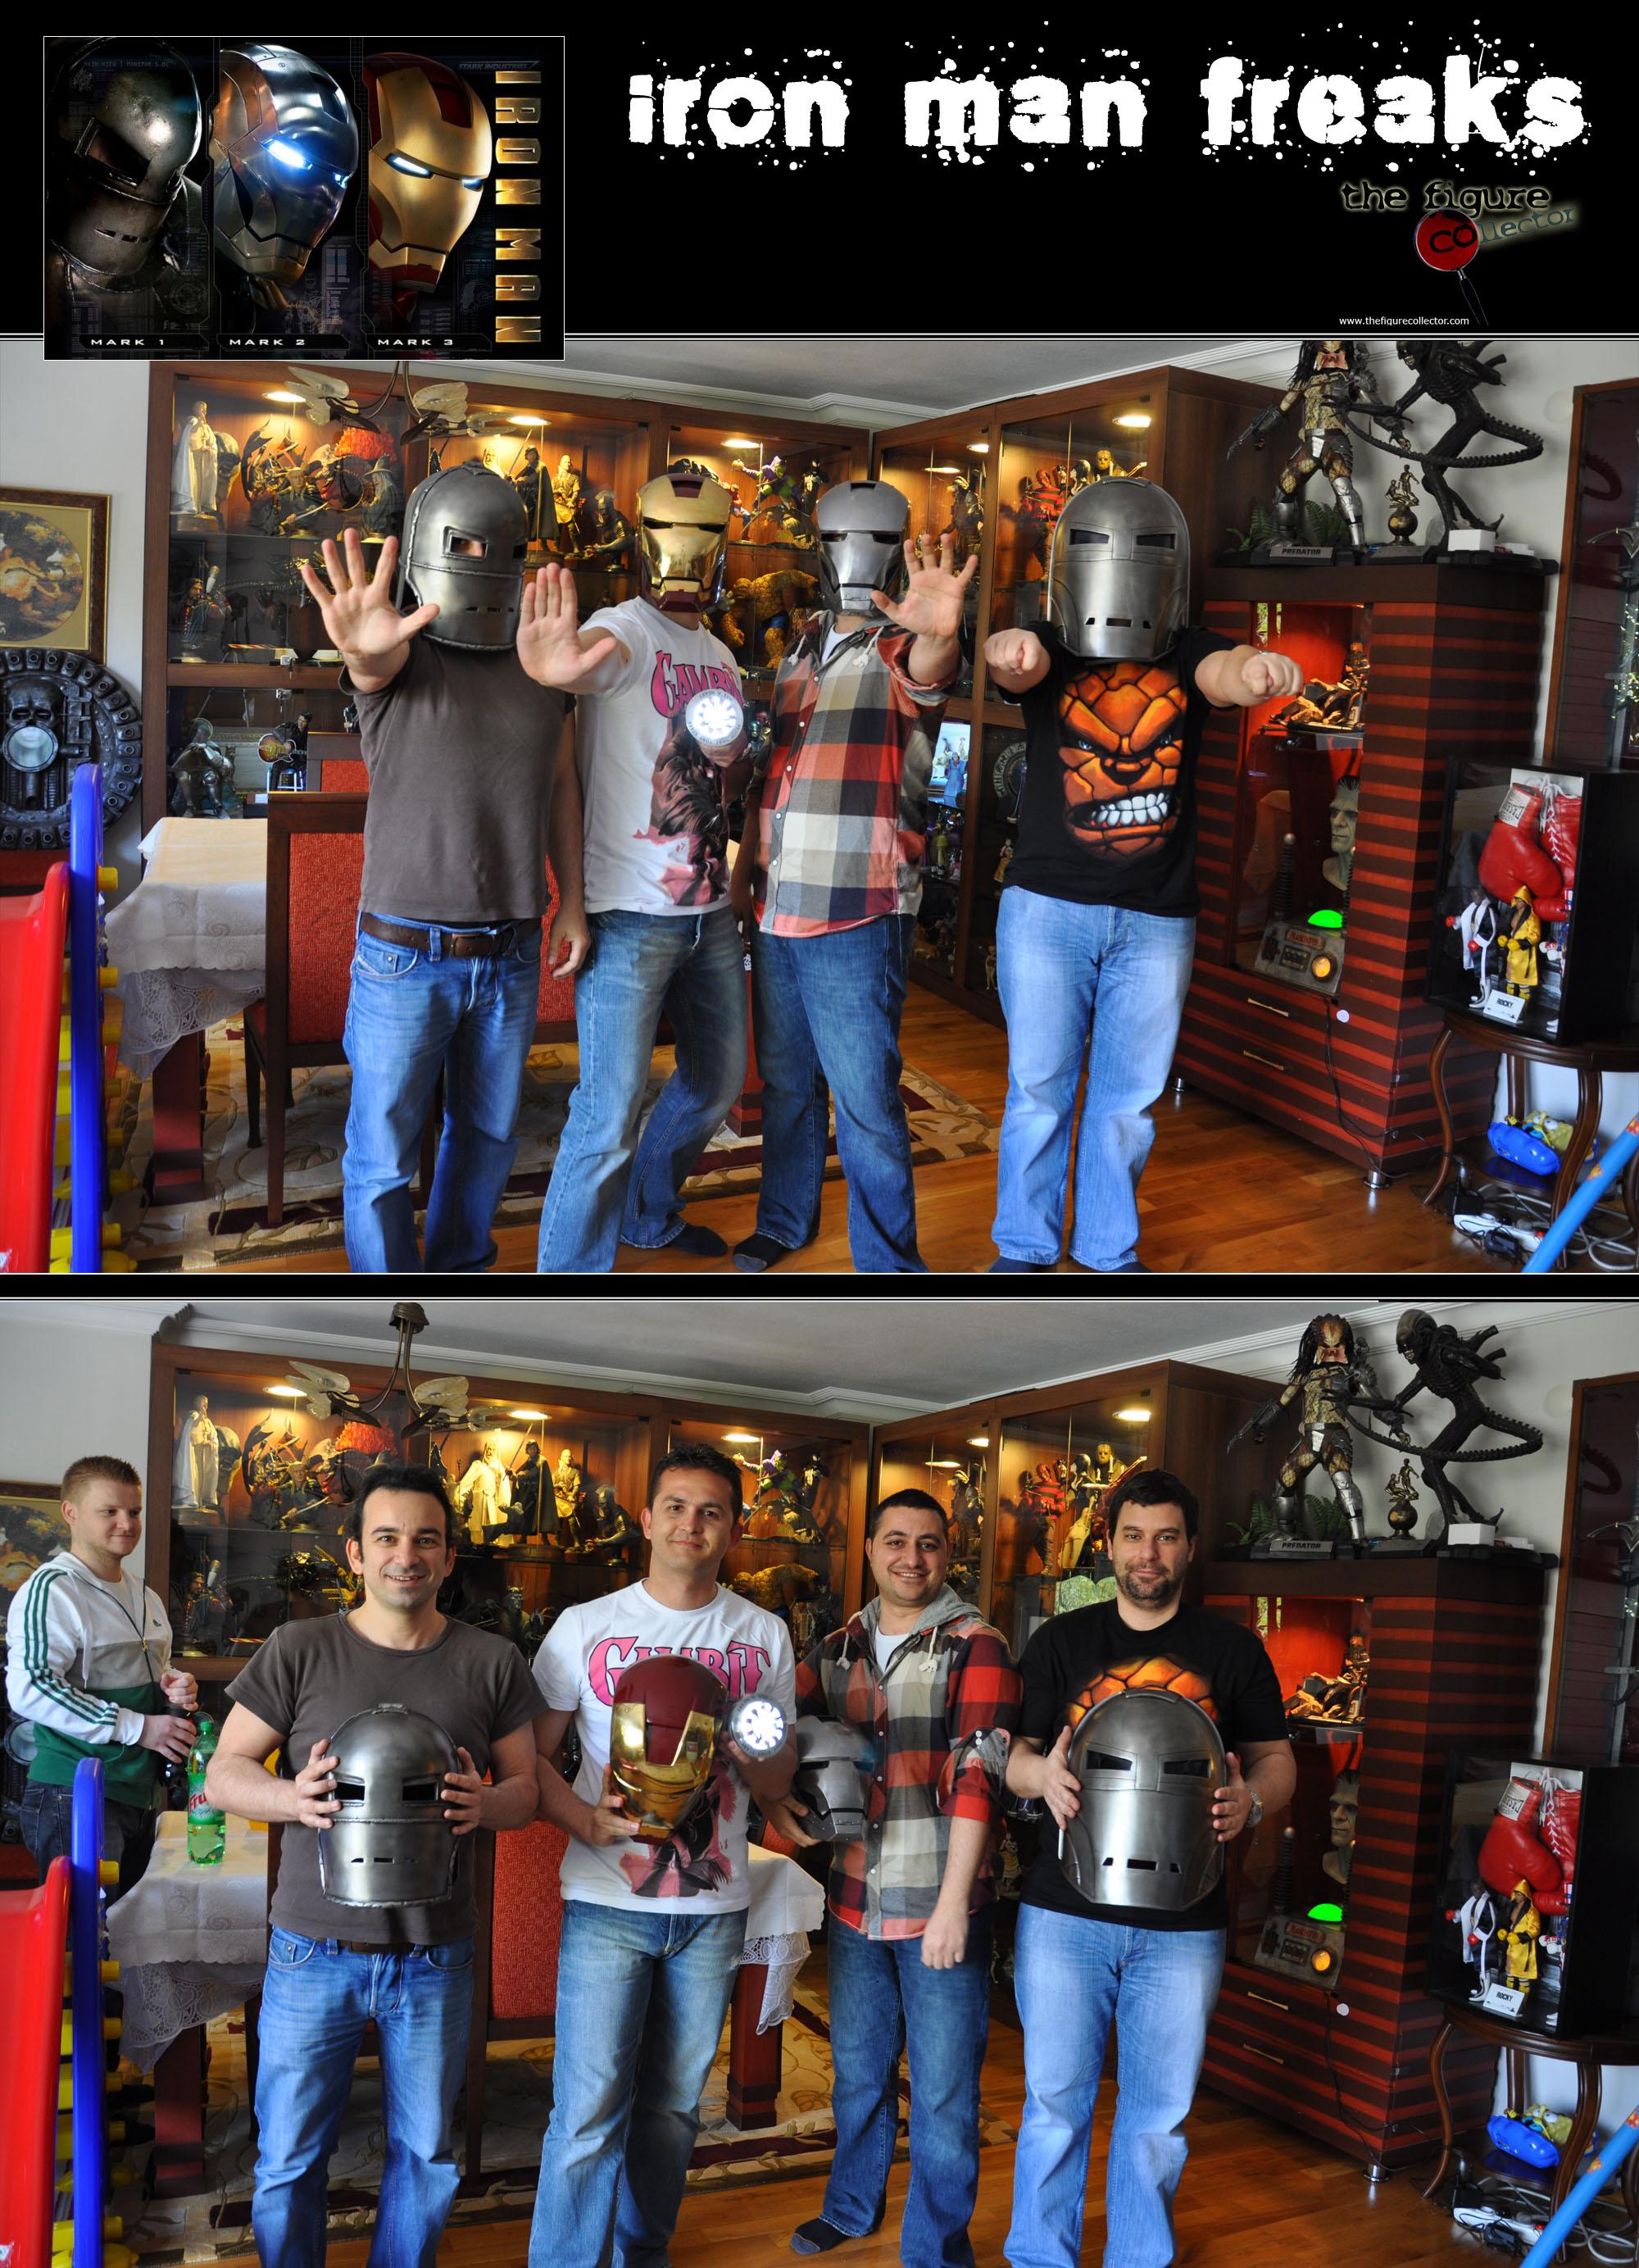 Colecao do Turco louis gara do forum Sideshow Collectors! Pobrinho!!! CollectorTurk-Meeting-05-ironman-tonystarck